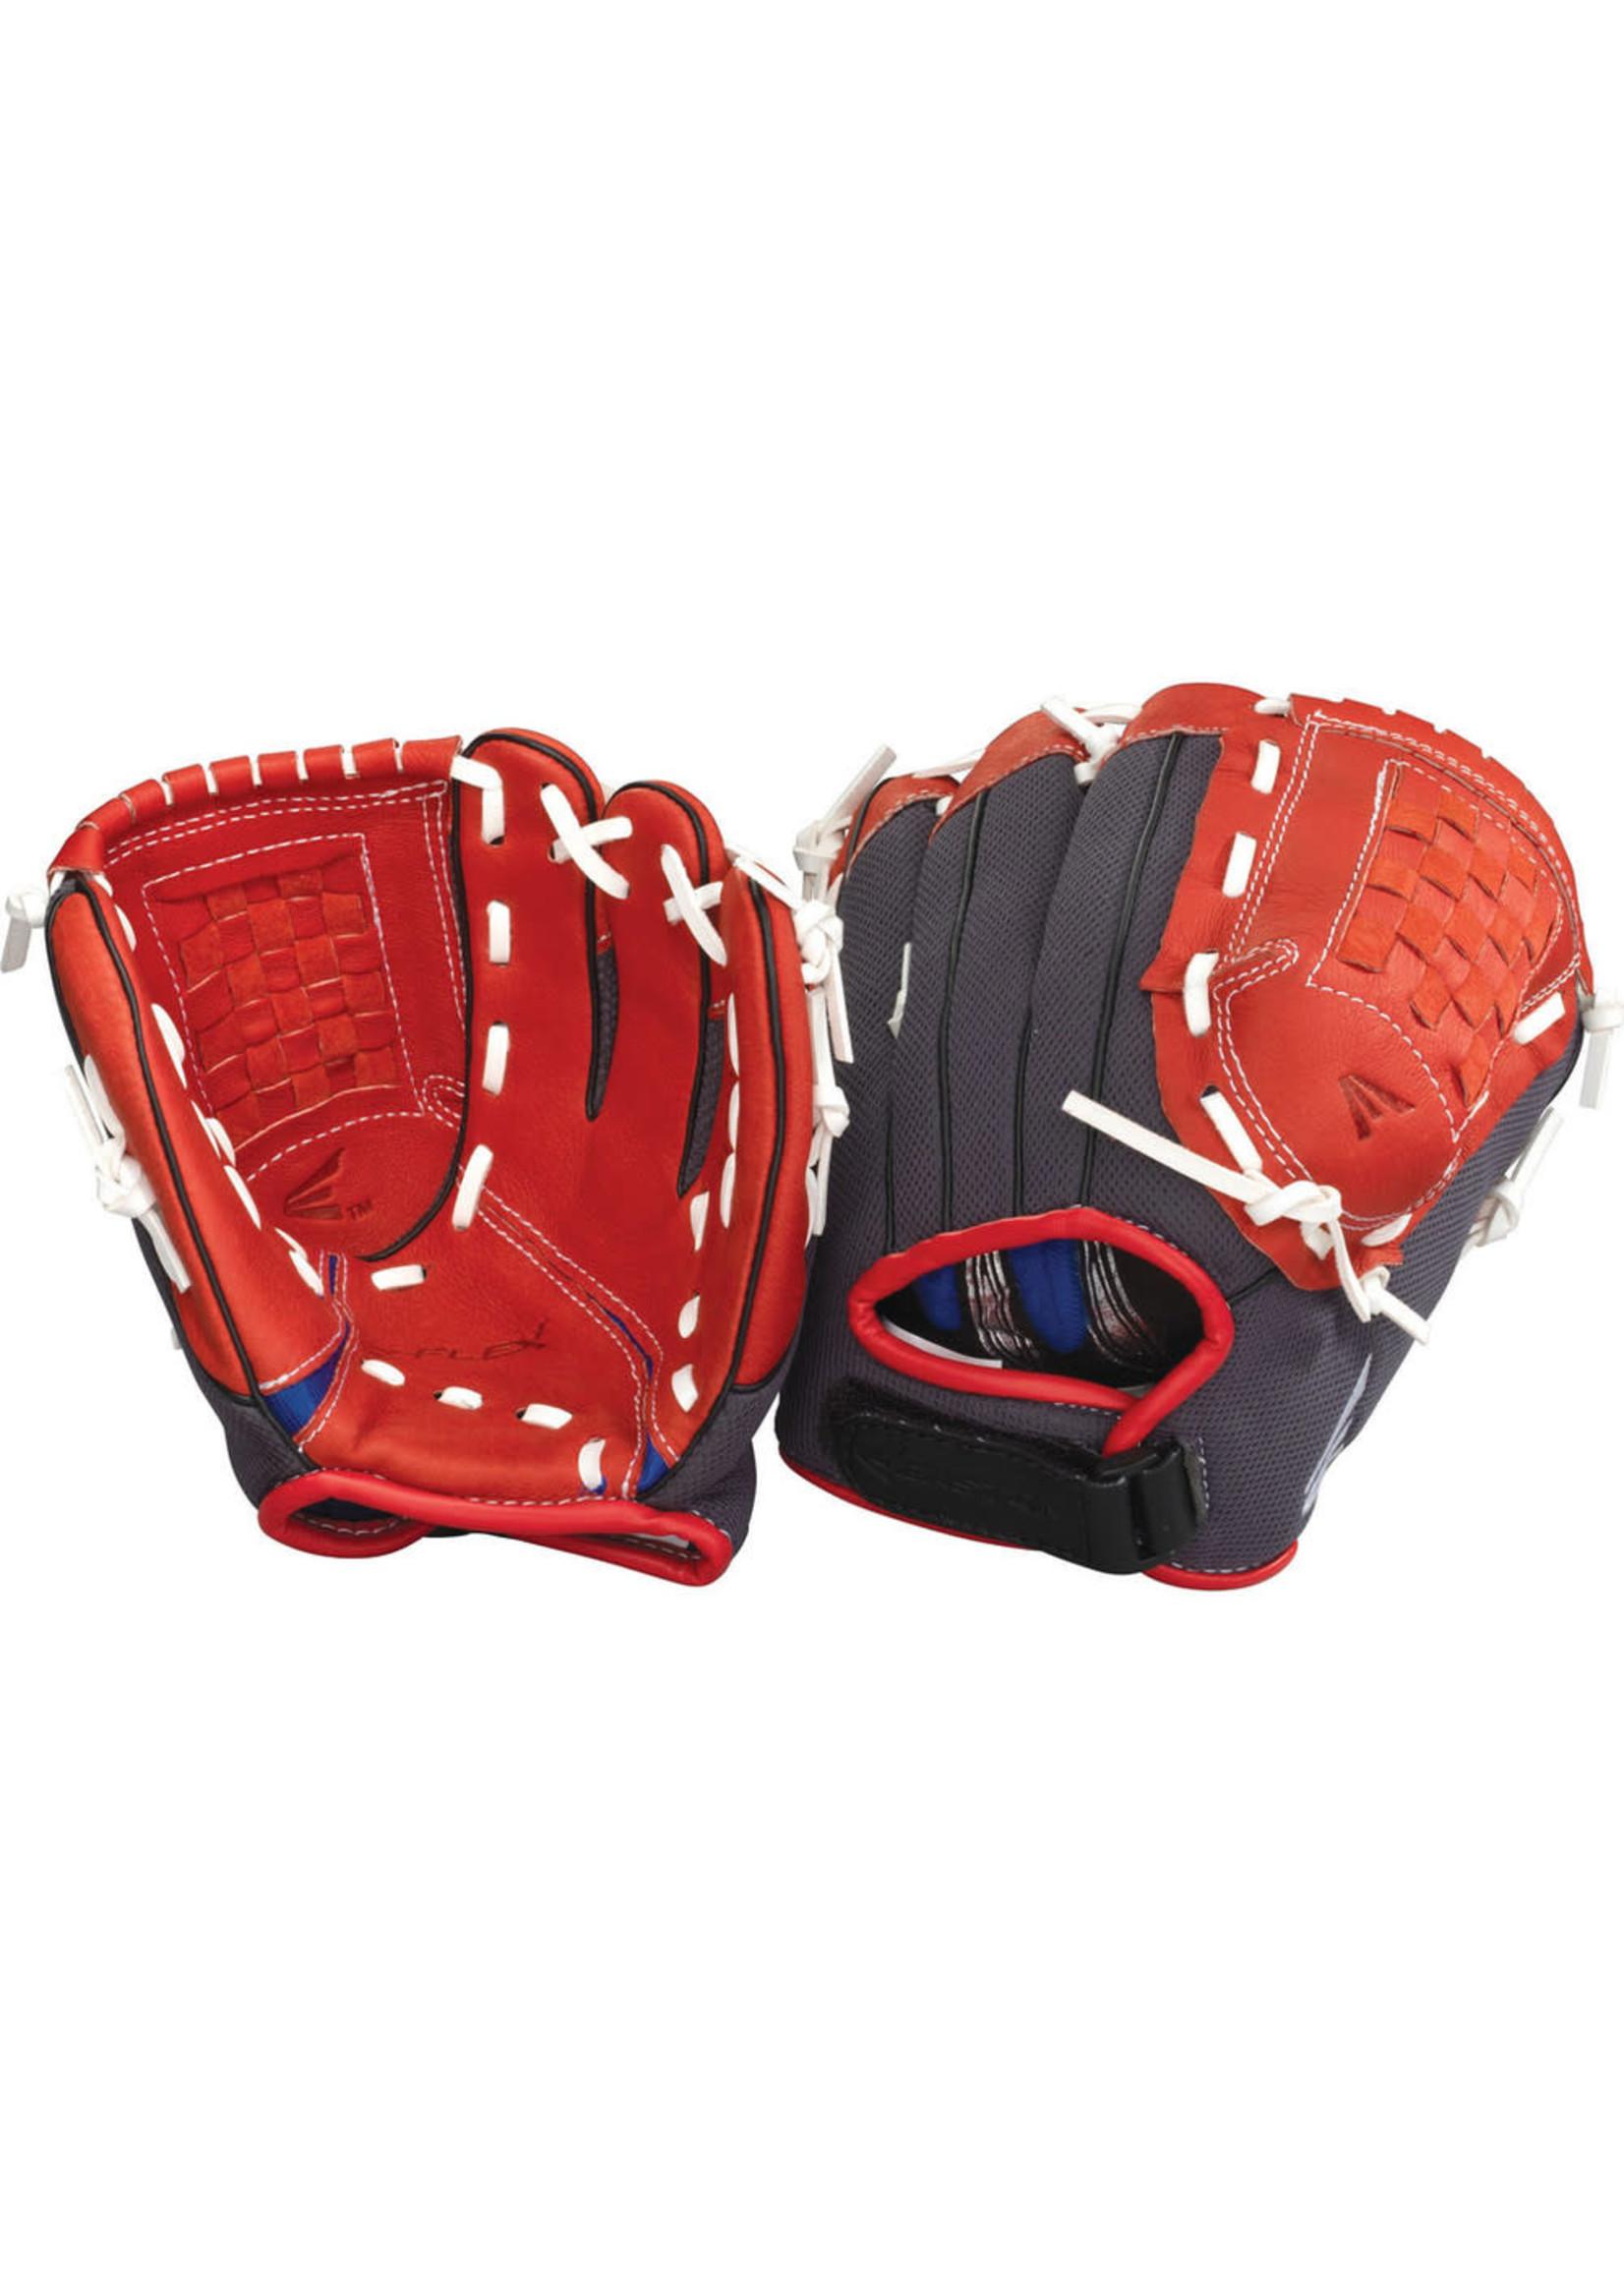 Easton Baseball (Canada) EASTON ZFX 1001RB LHT 10 IN